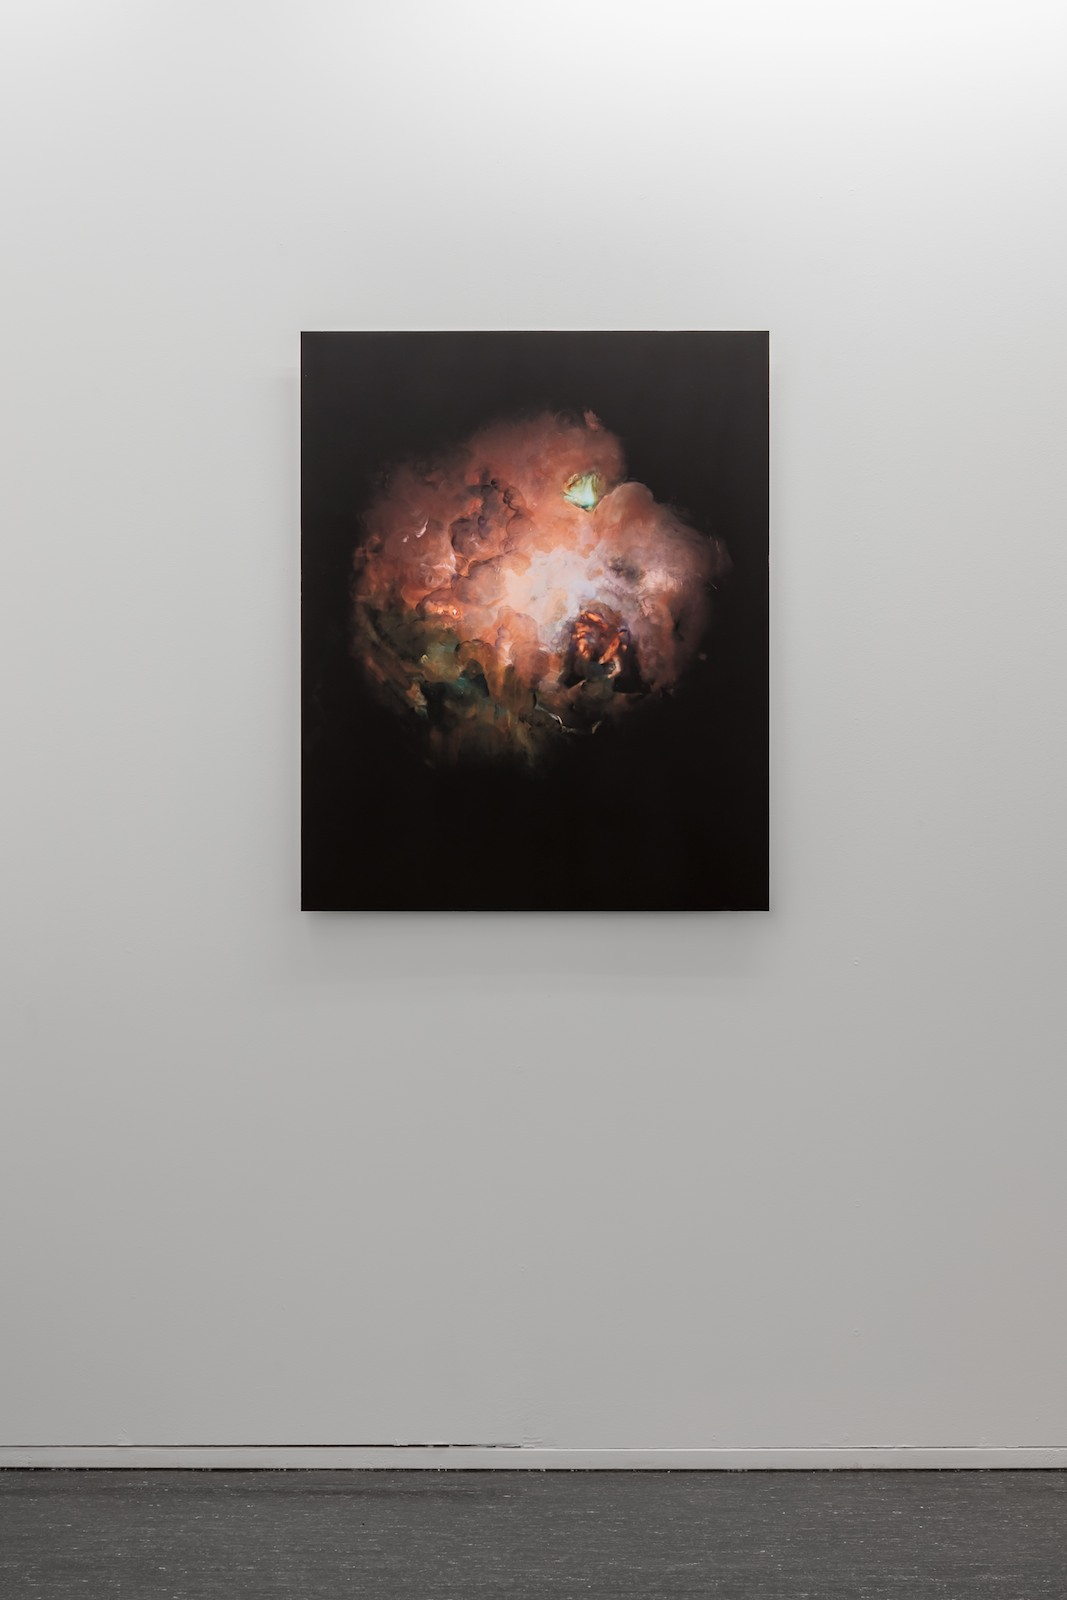 Untitled, 2015, pigment print mounted on aluminium, 95 x 76 cm, ed. 5